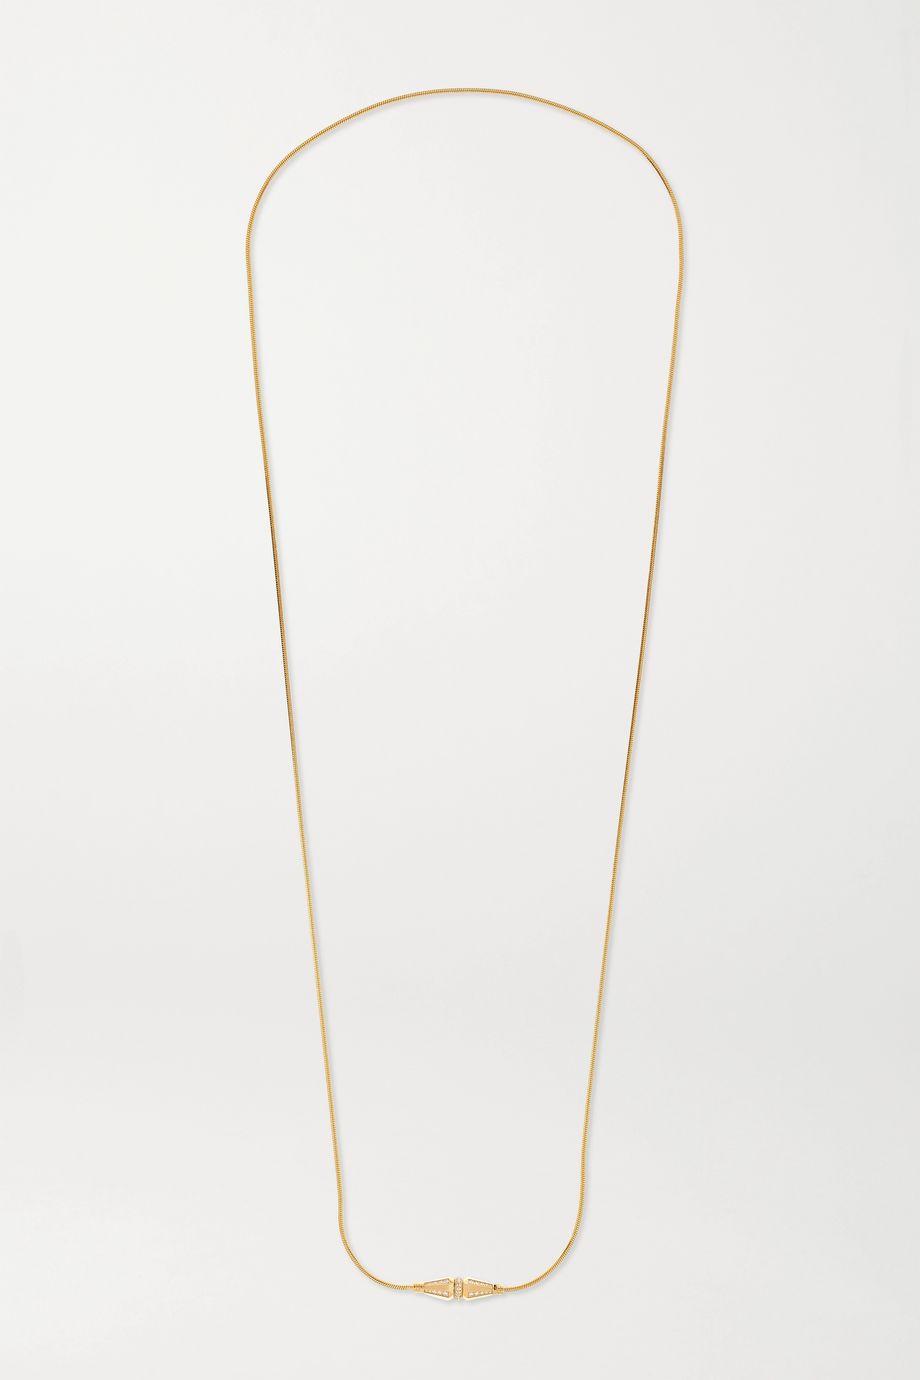 Boucheron Jack de Boucheron 18-karat gold diamond necklace